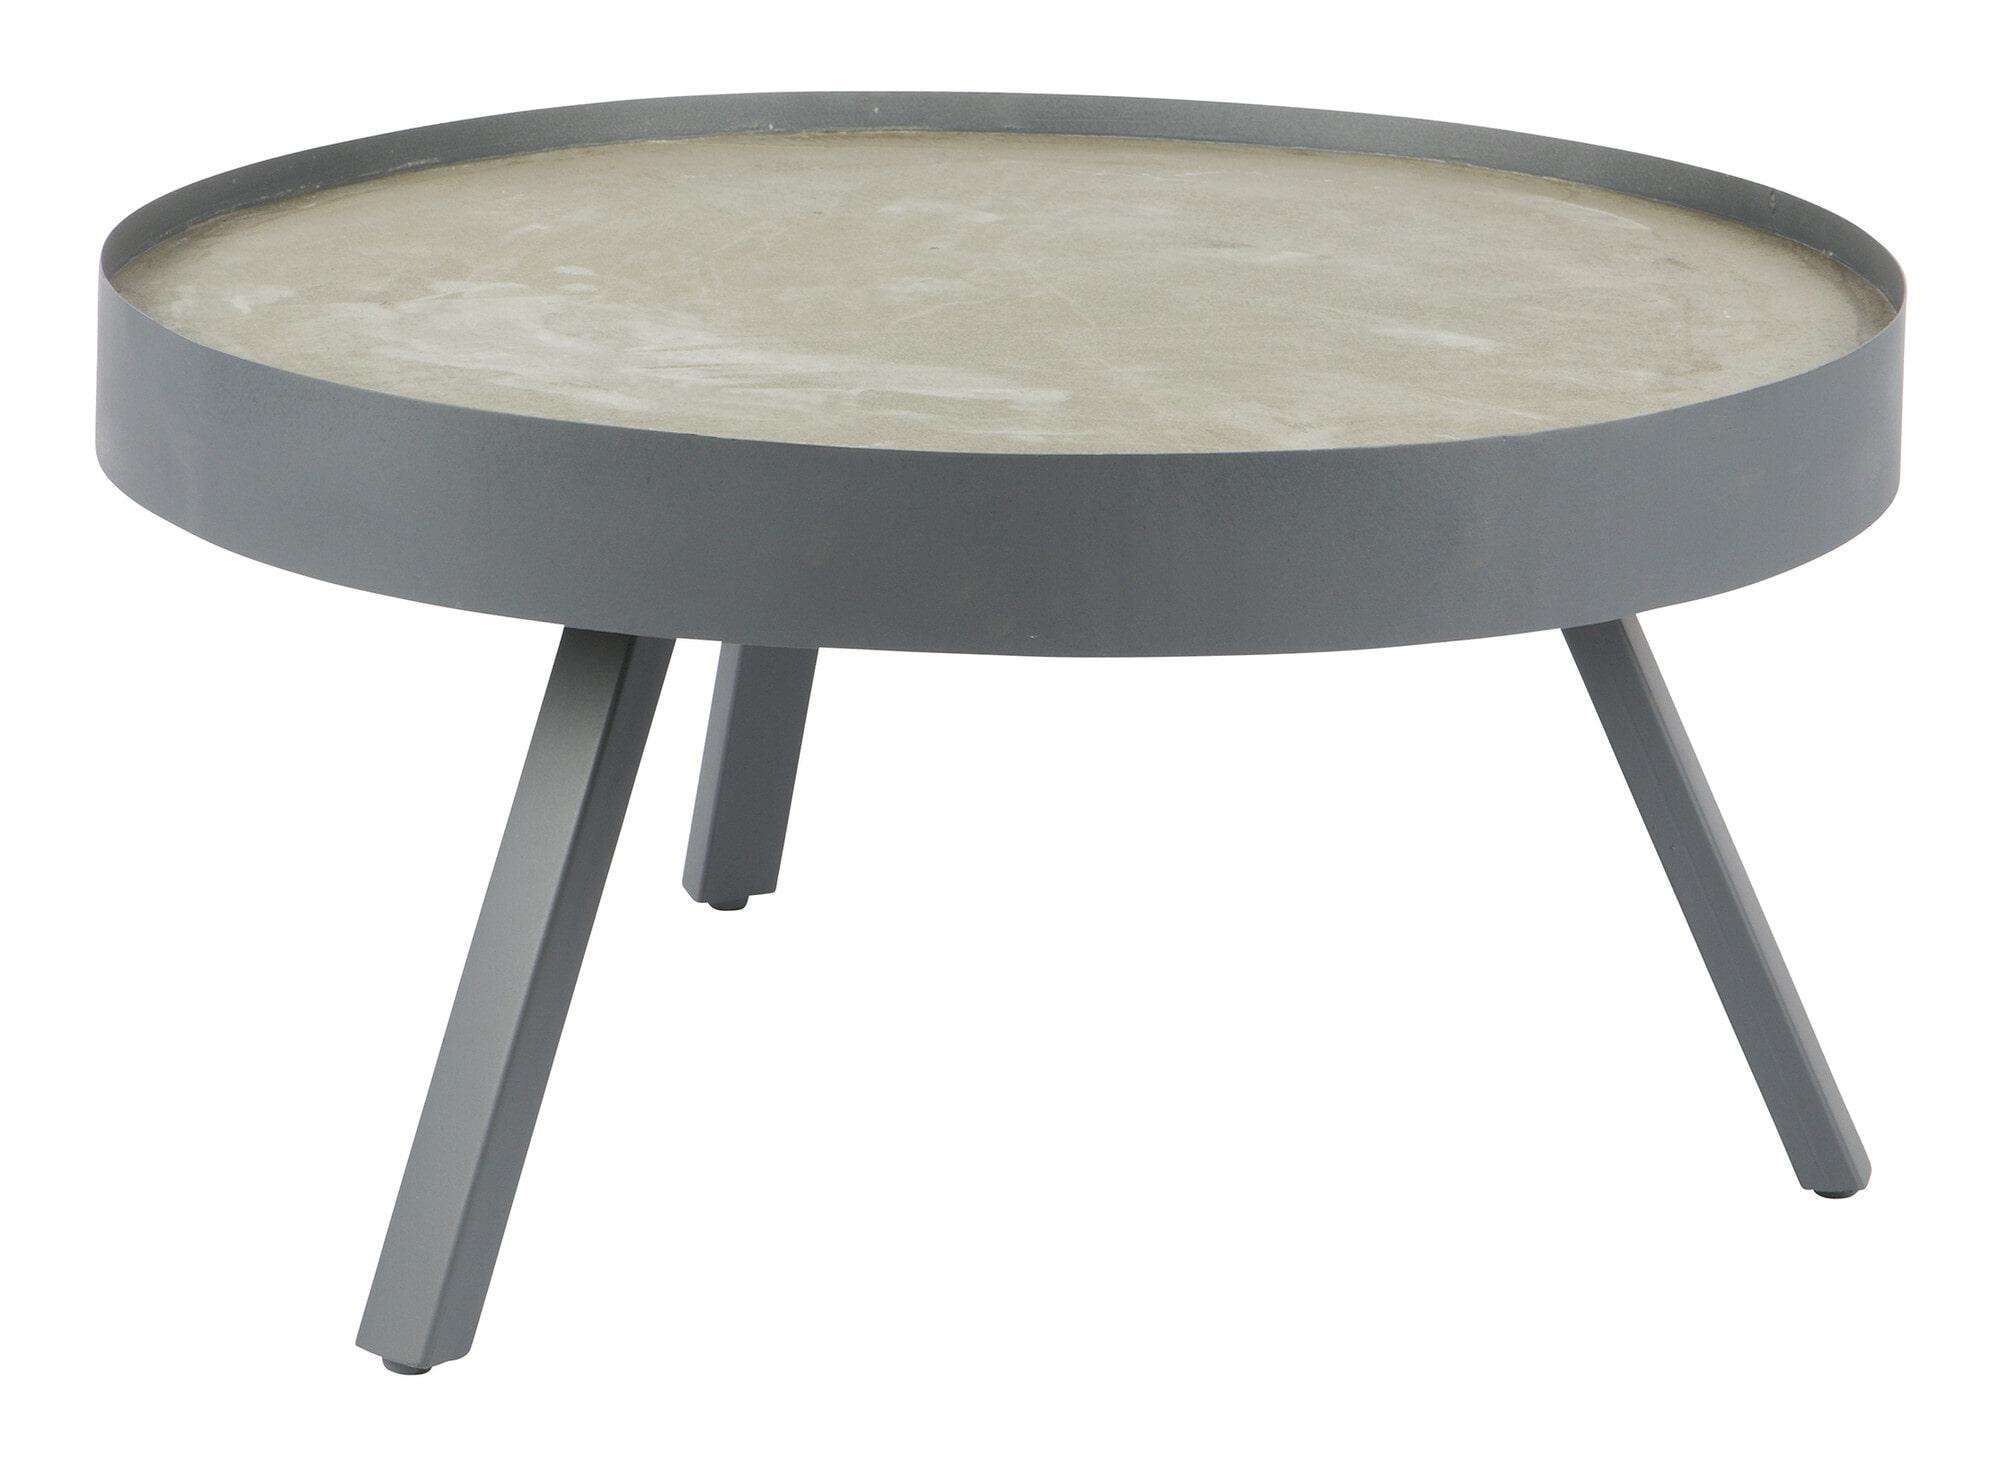 Woood Tafel Rond : Woood salontafel skip beton cm g meubelpartner